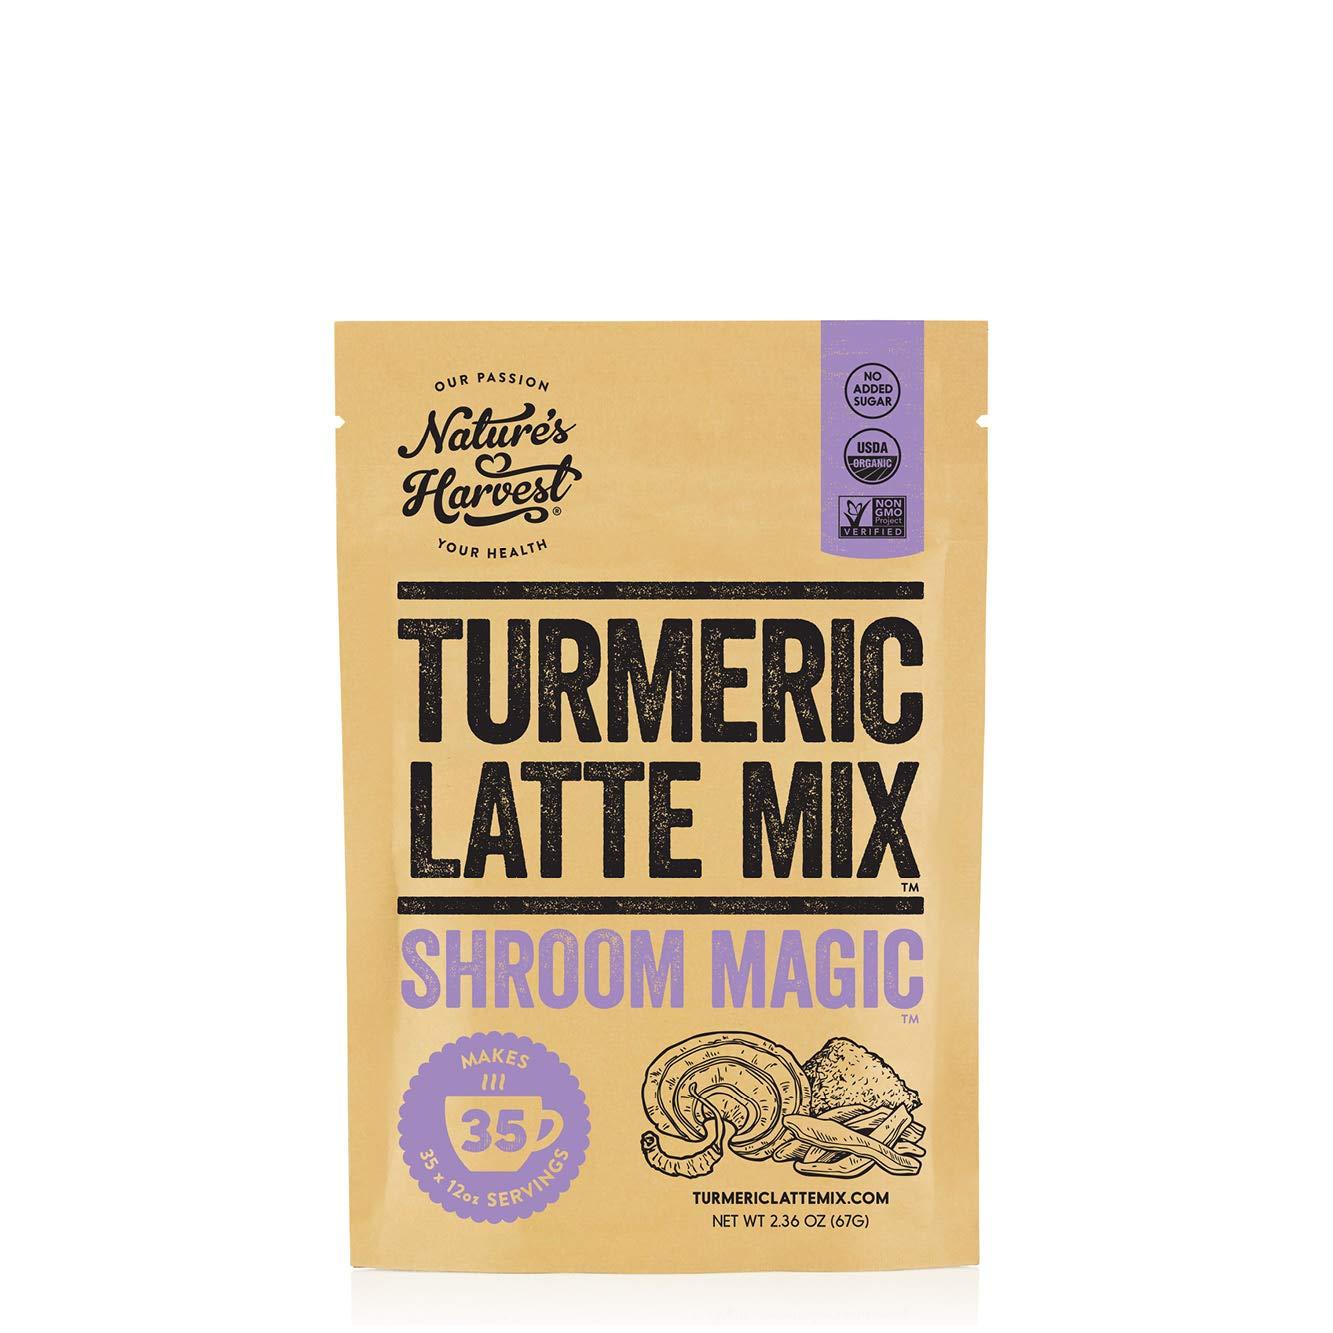 Nature's Harvest Mushroom Powder Turmeric Latte Mix - (35 servings) - Shroom Magic 5 Mushroom Blends with Reishi, Chaga, Cordyceps, Lion's Mane and Turkey Tail - For Hot and Cold Drinks